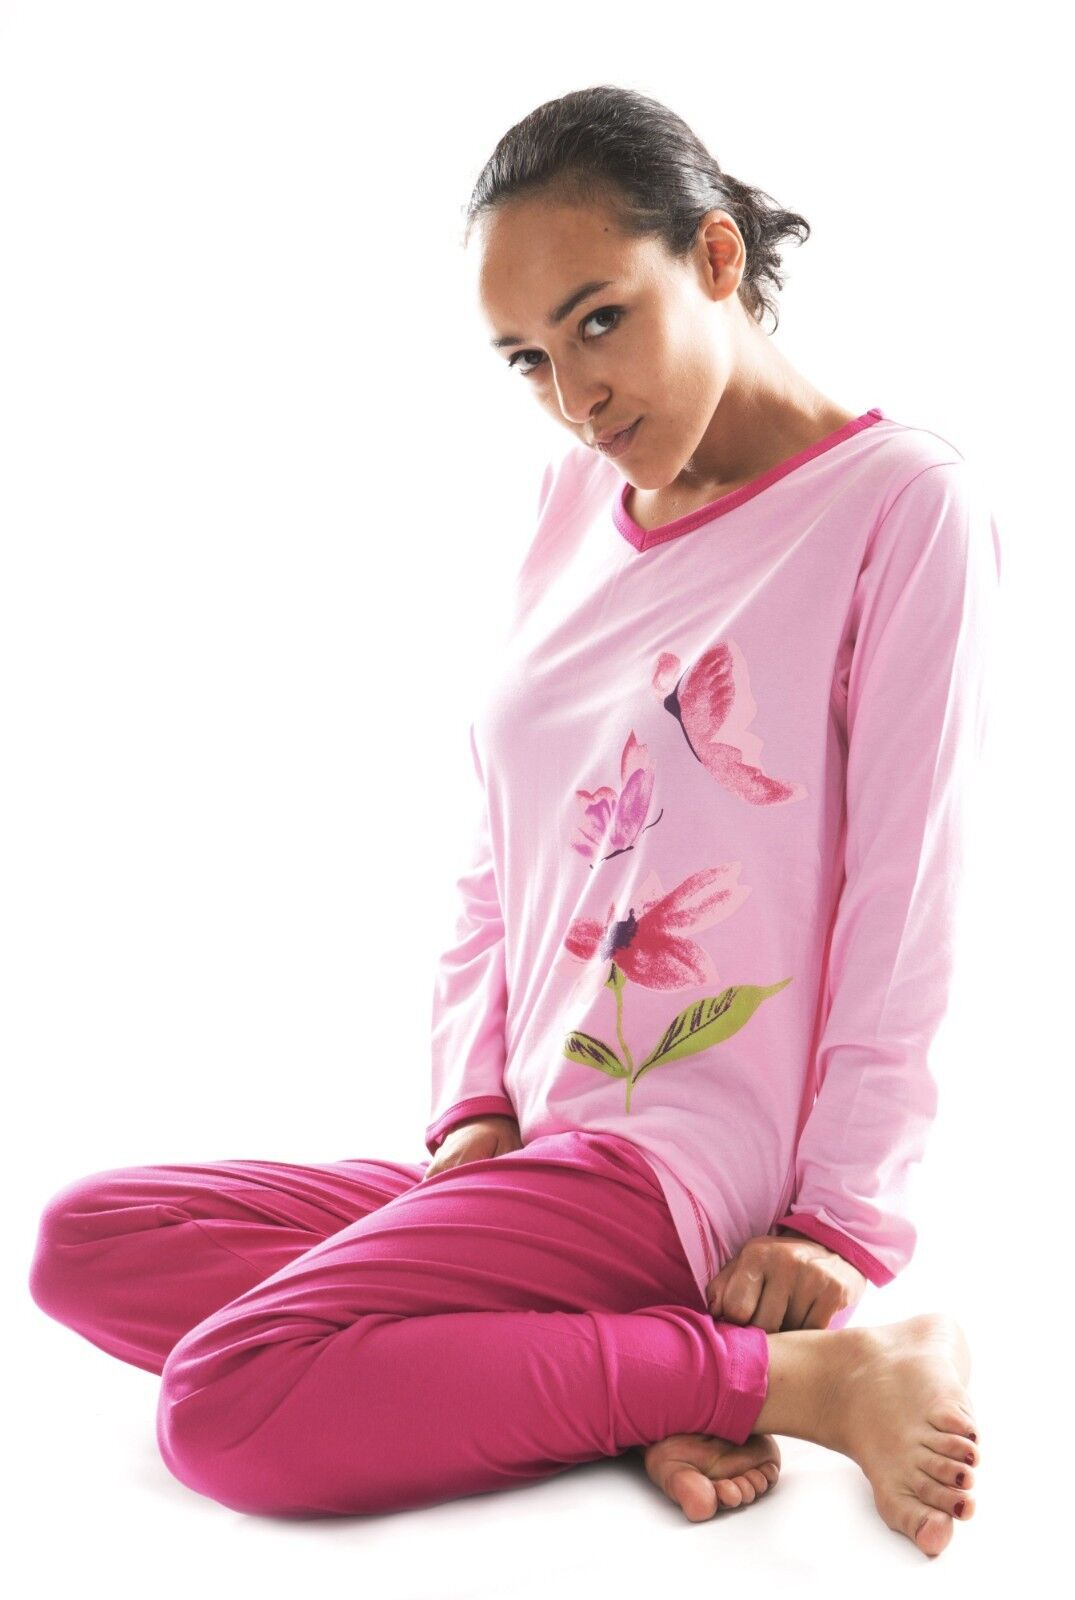 Damen Langarm Pyjama Schlafanzug (DW955) Gr. 38 NEU Baumwolle Jersey